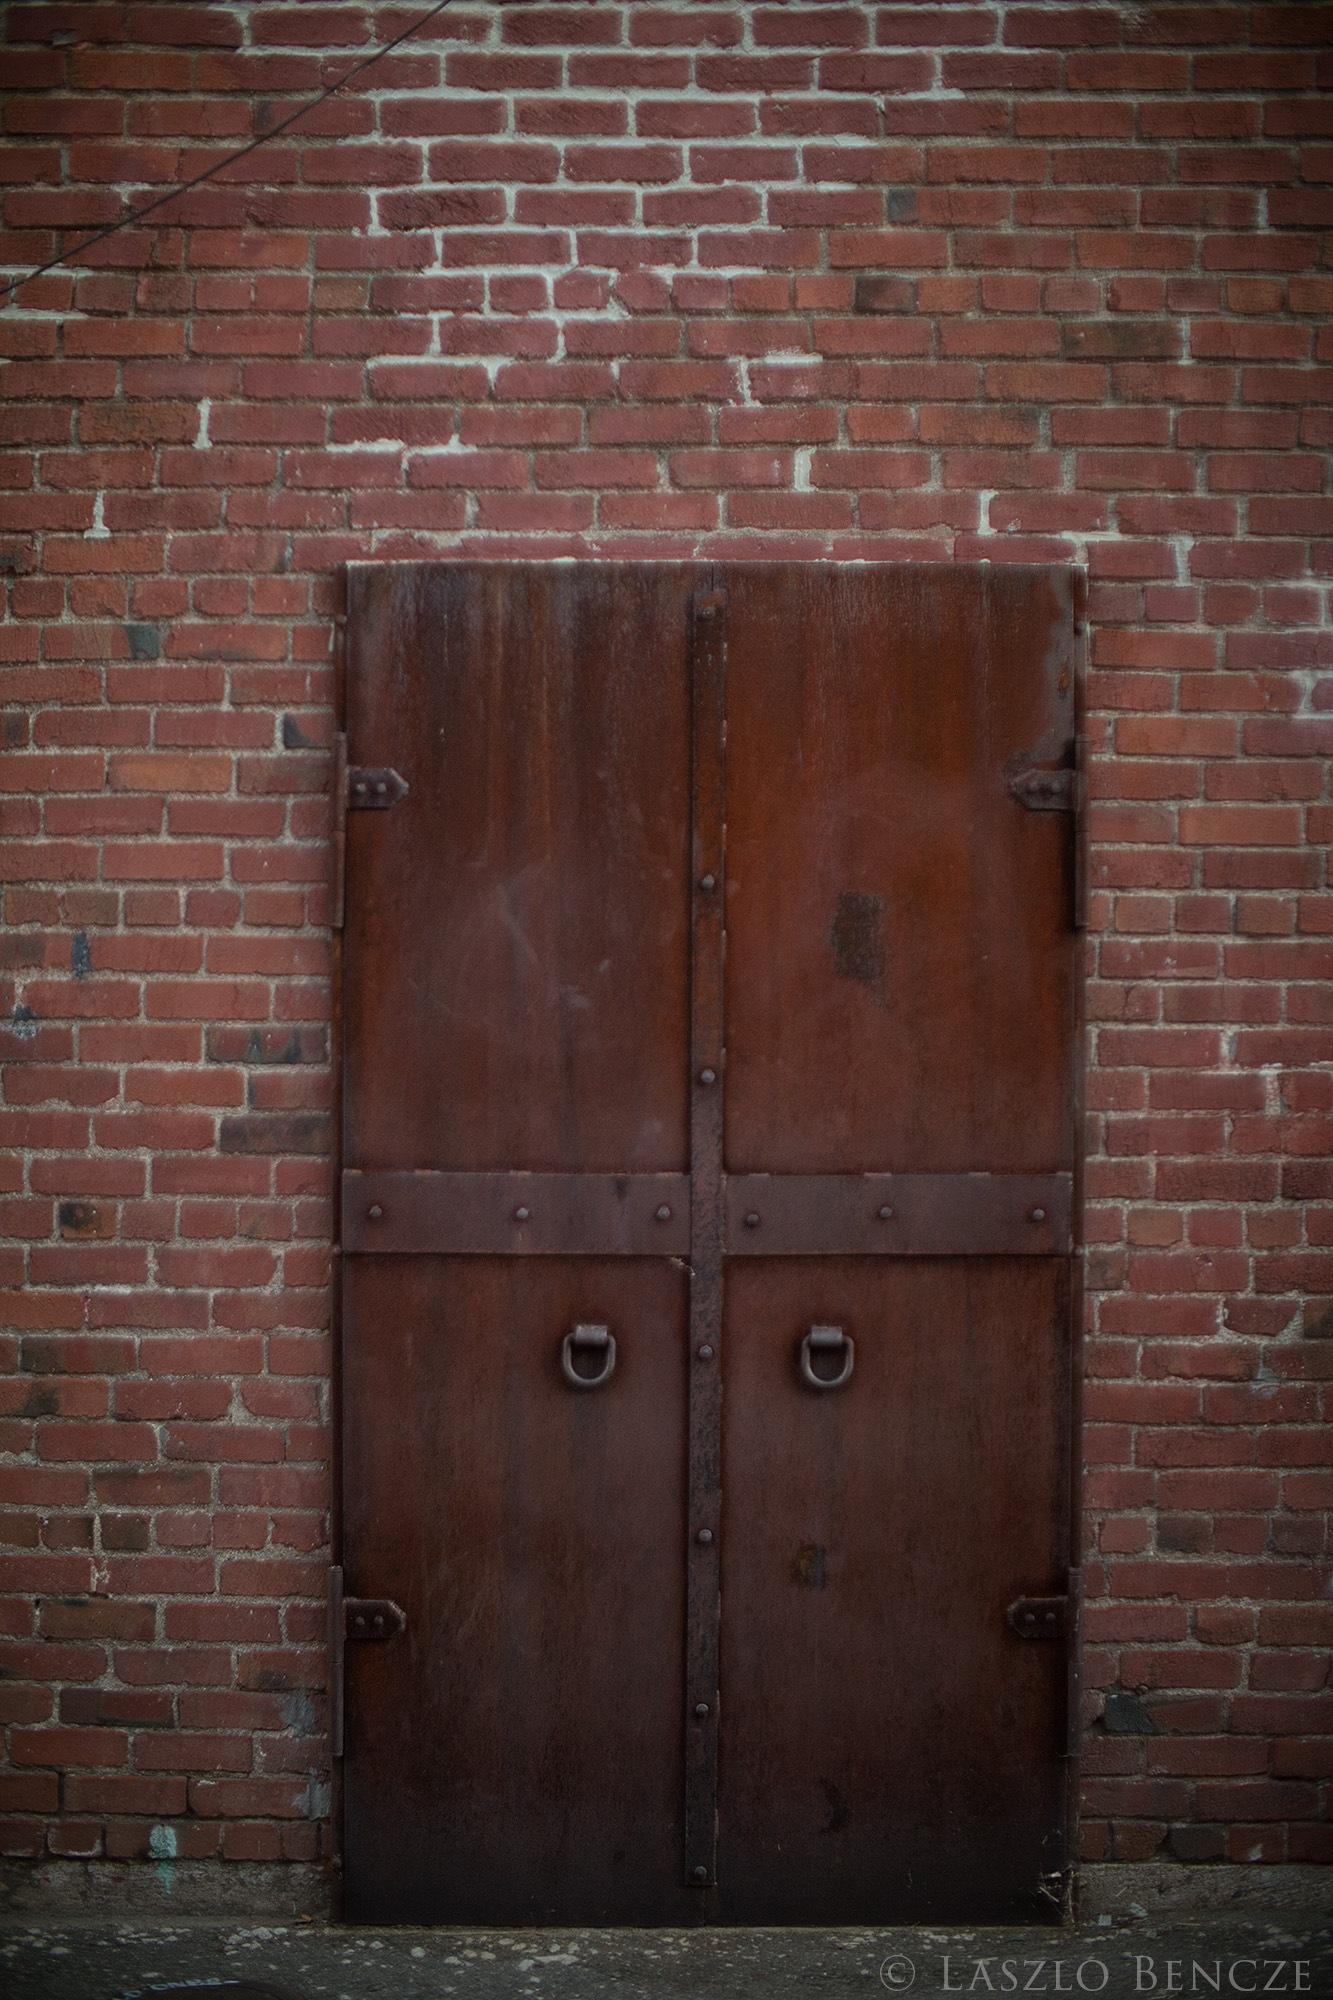 Old Roseville #19, Iron Door, Project f1.0 by Laszlo Bencze